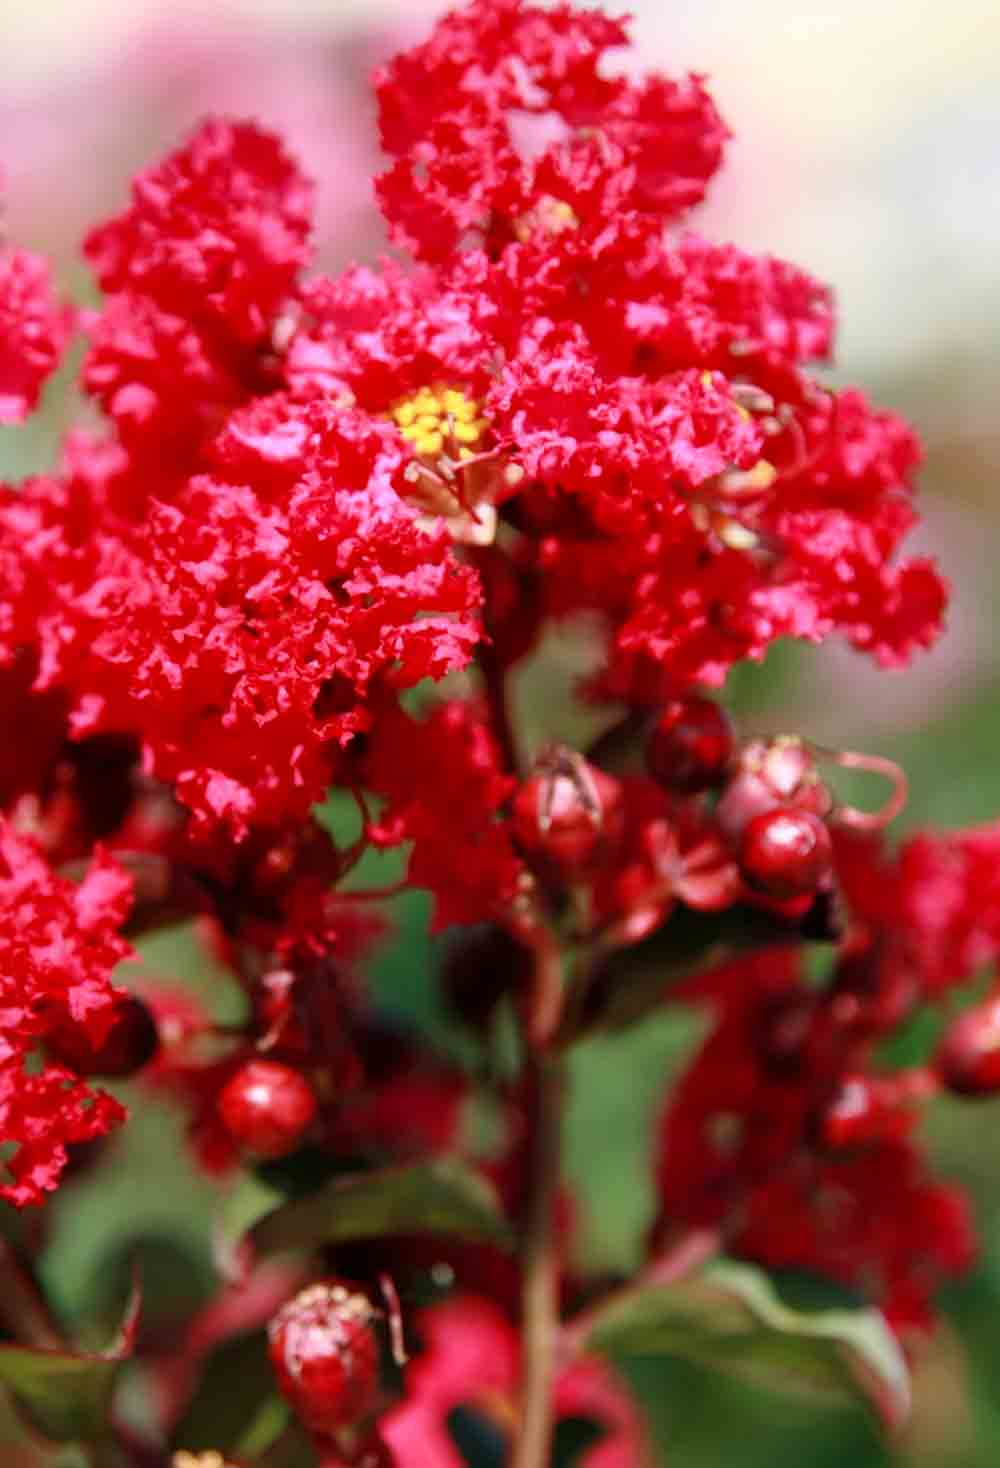 Lagestroemia Touffe 'Petit Red'